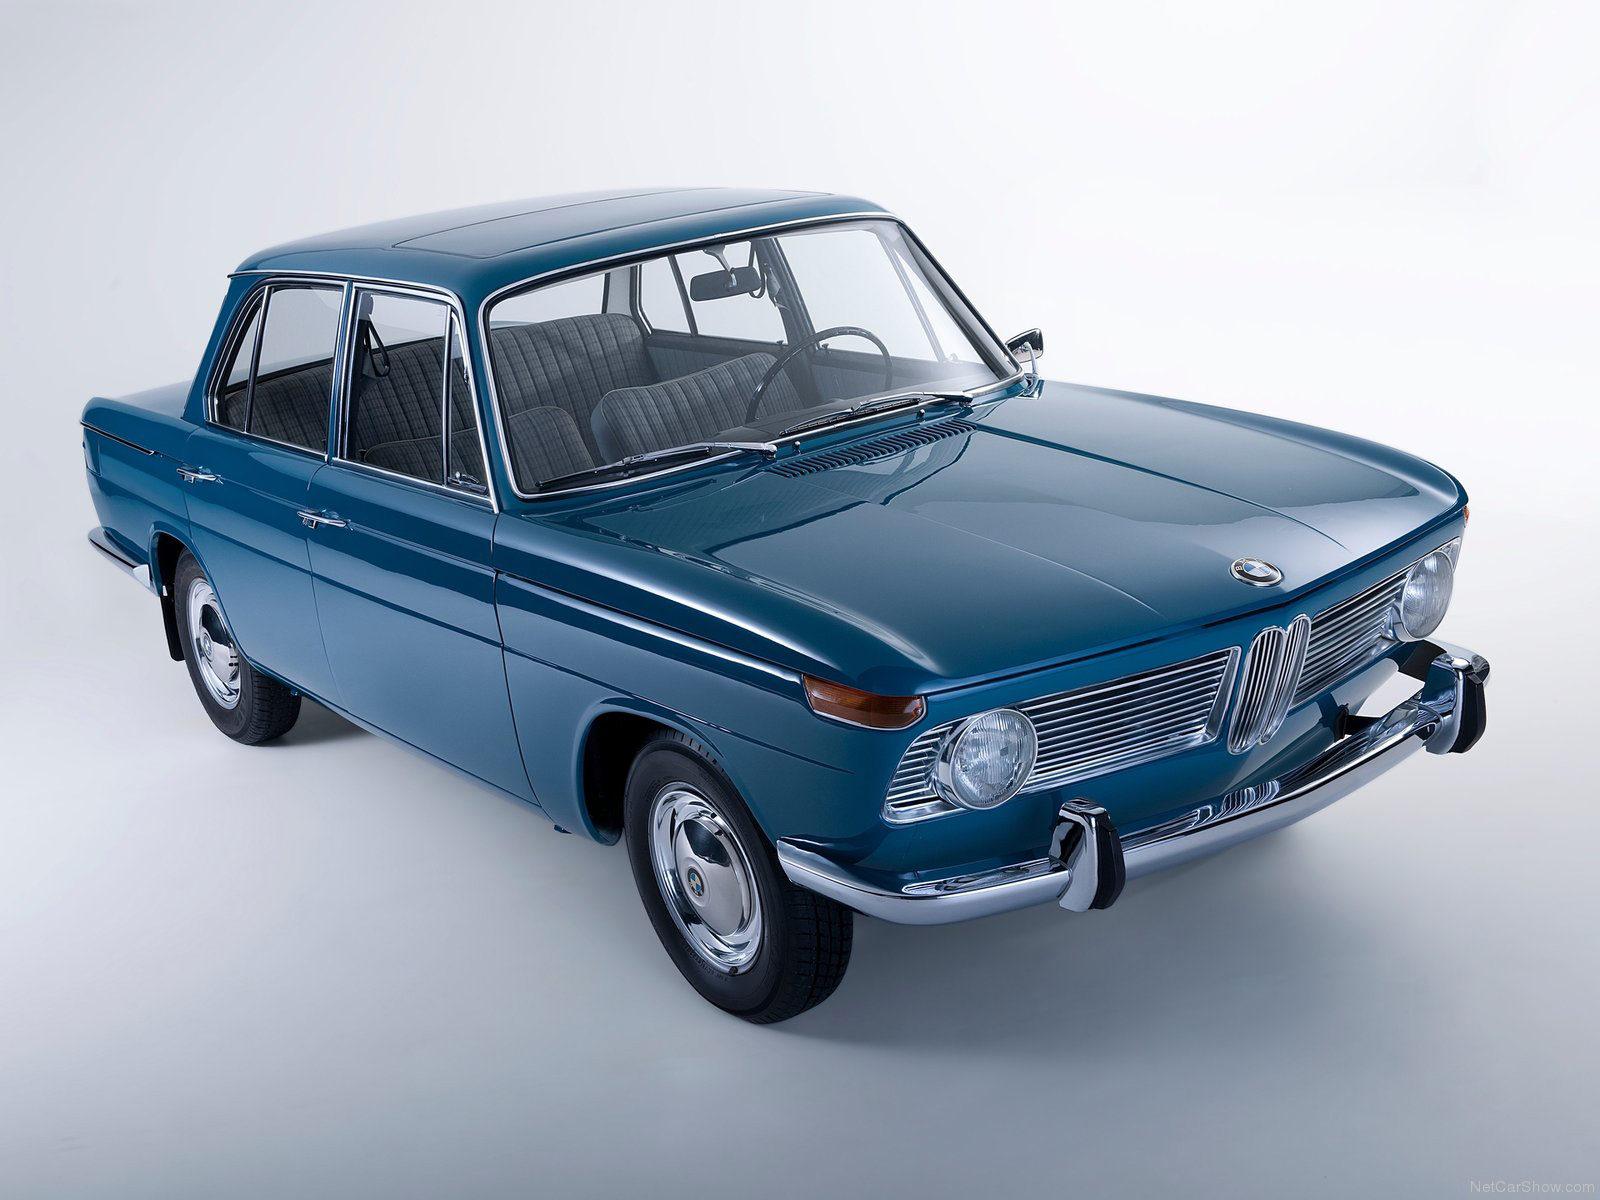 BMW New Class 1500 1962 - 1964 Sedan #5